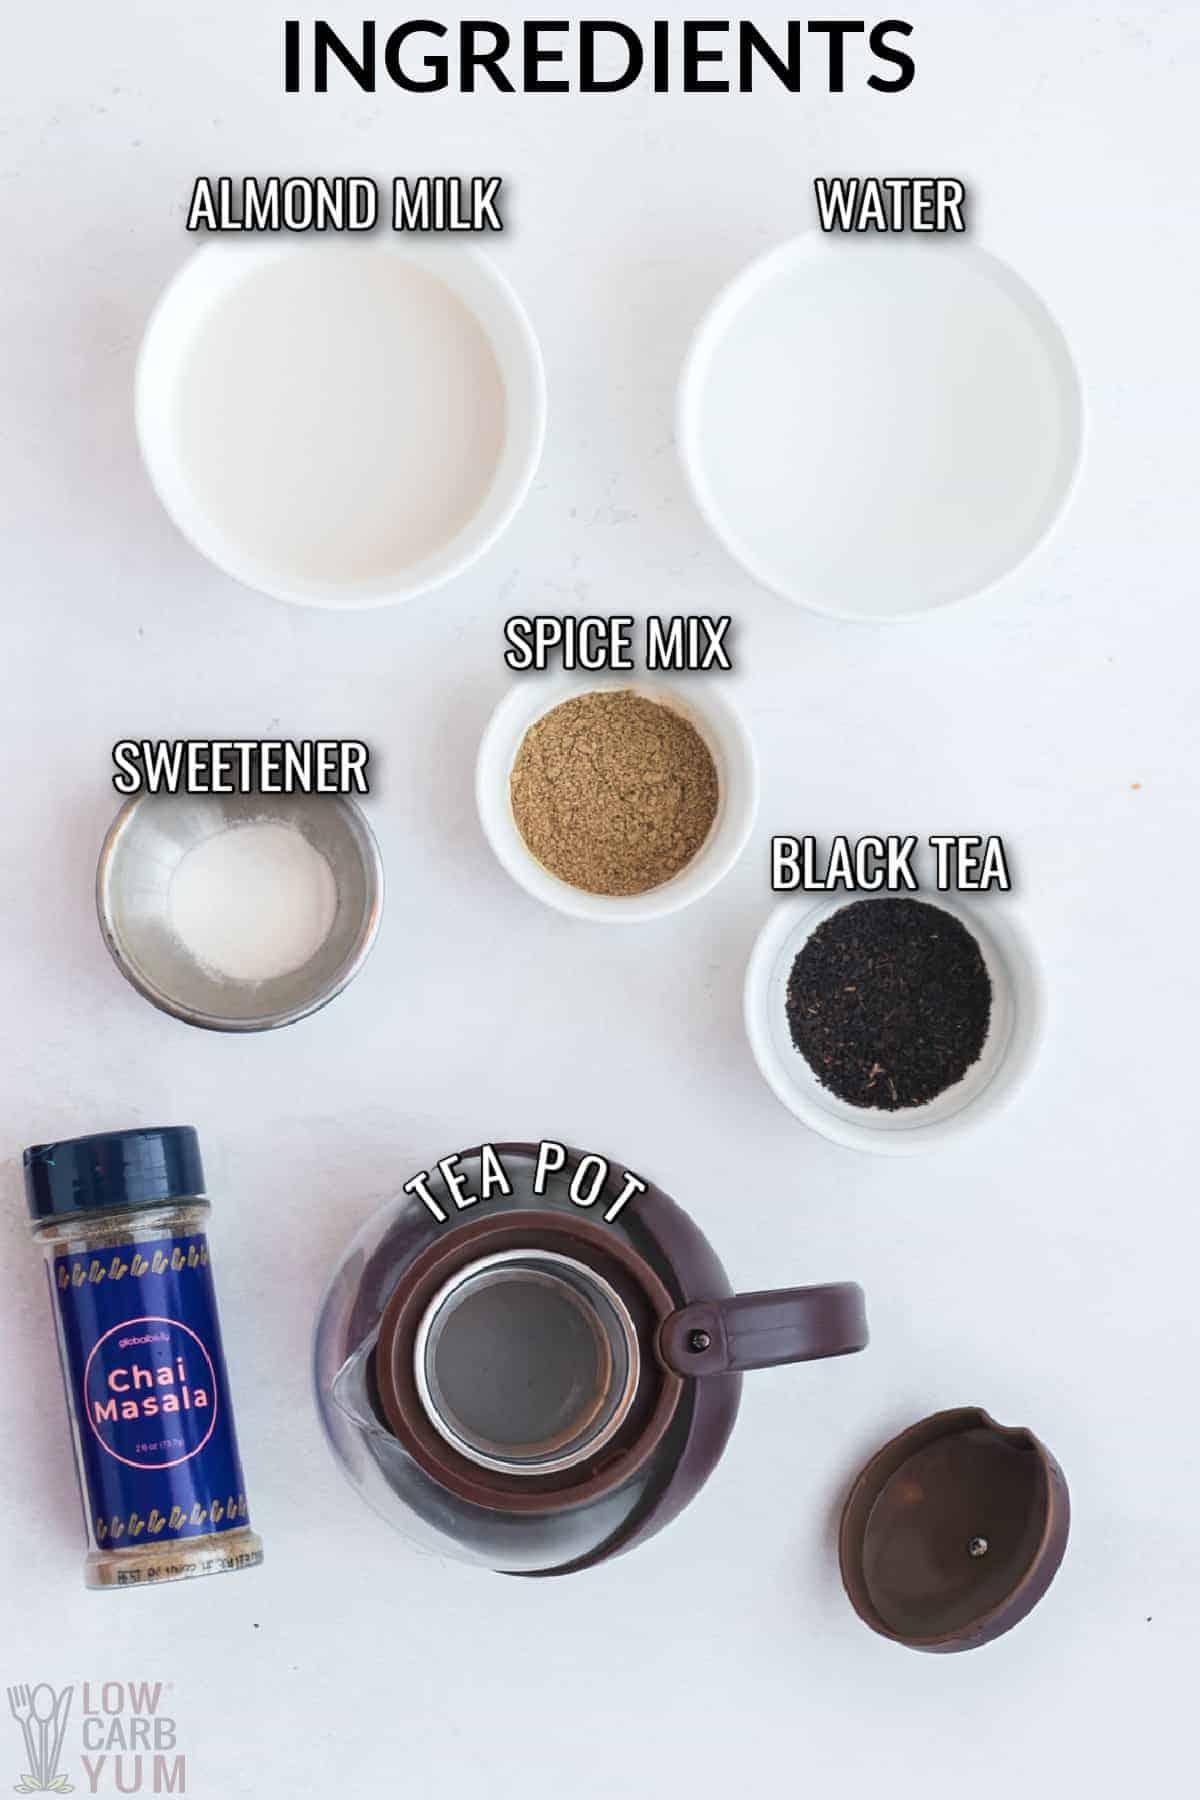 ingredients to make the chai tea recipe